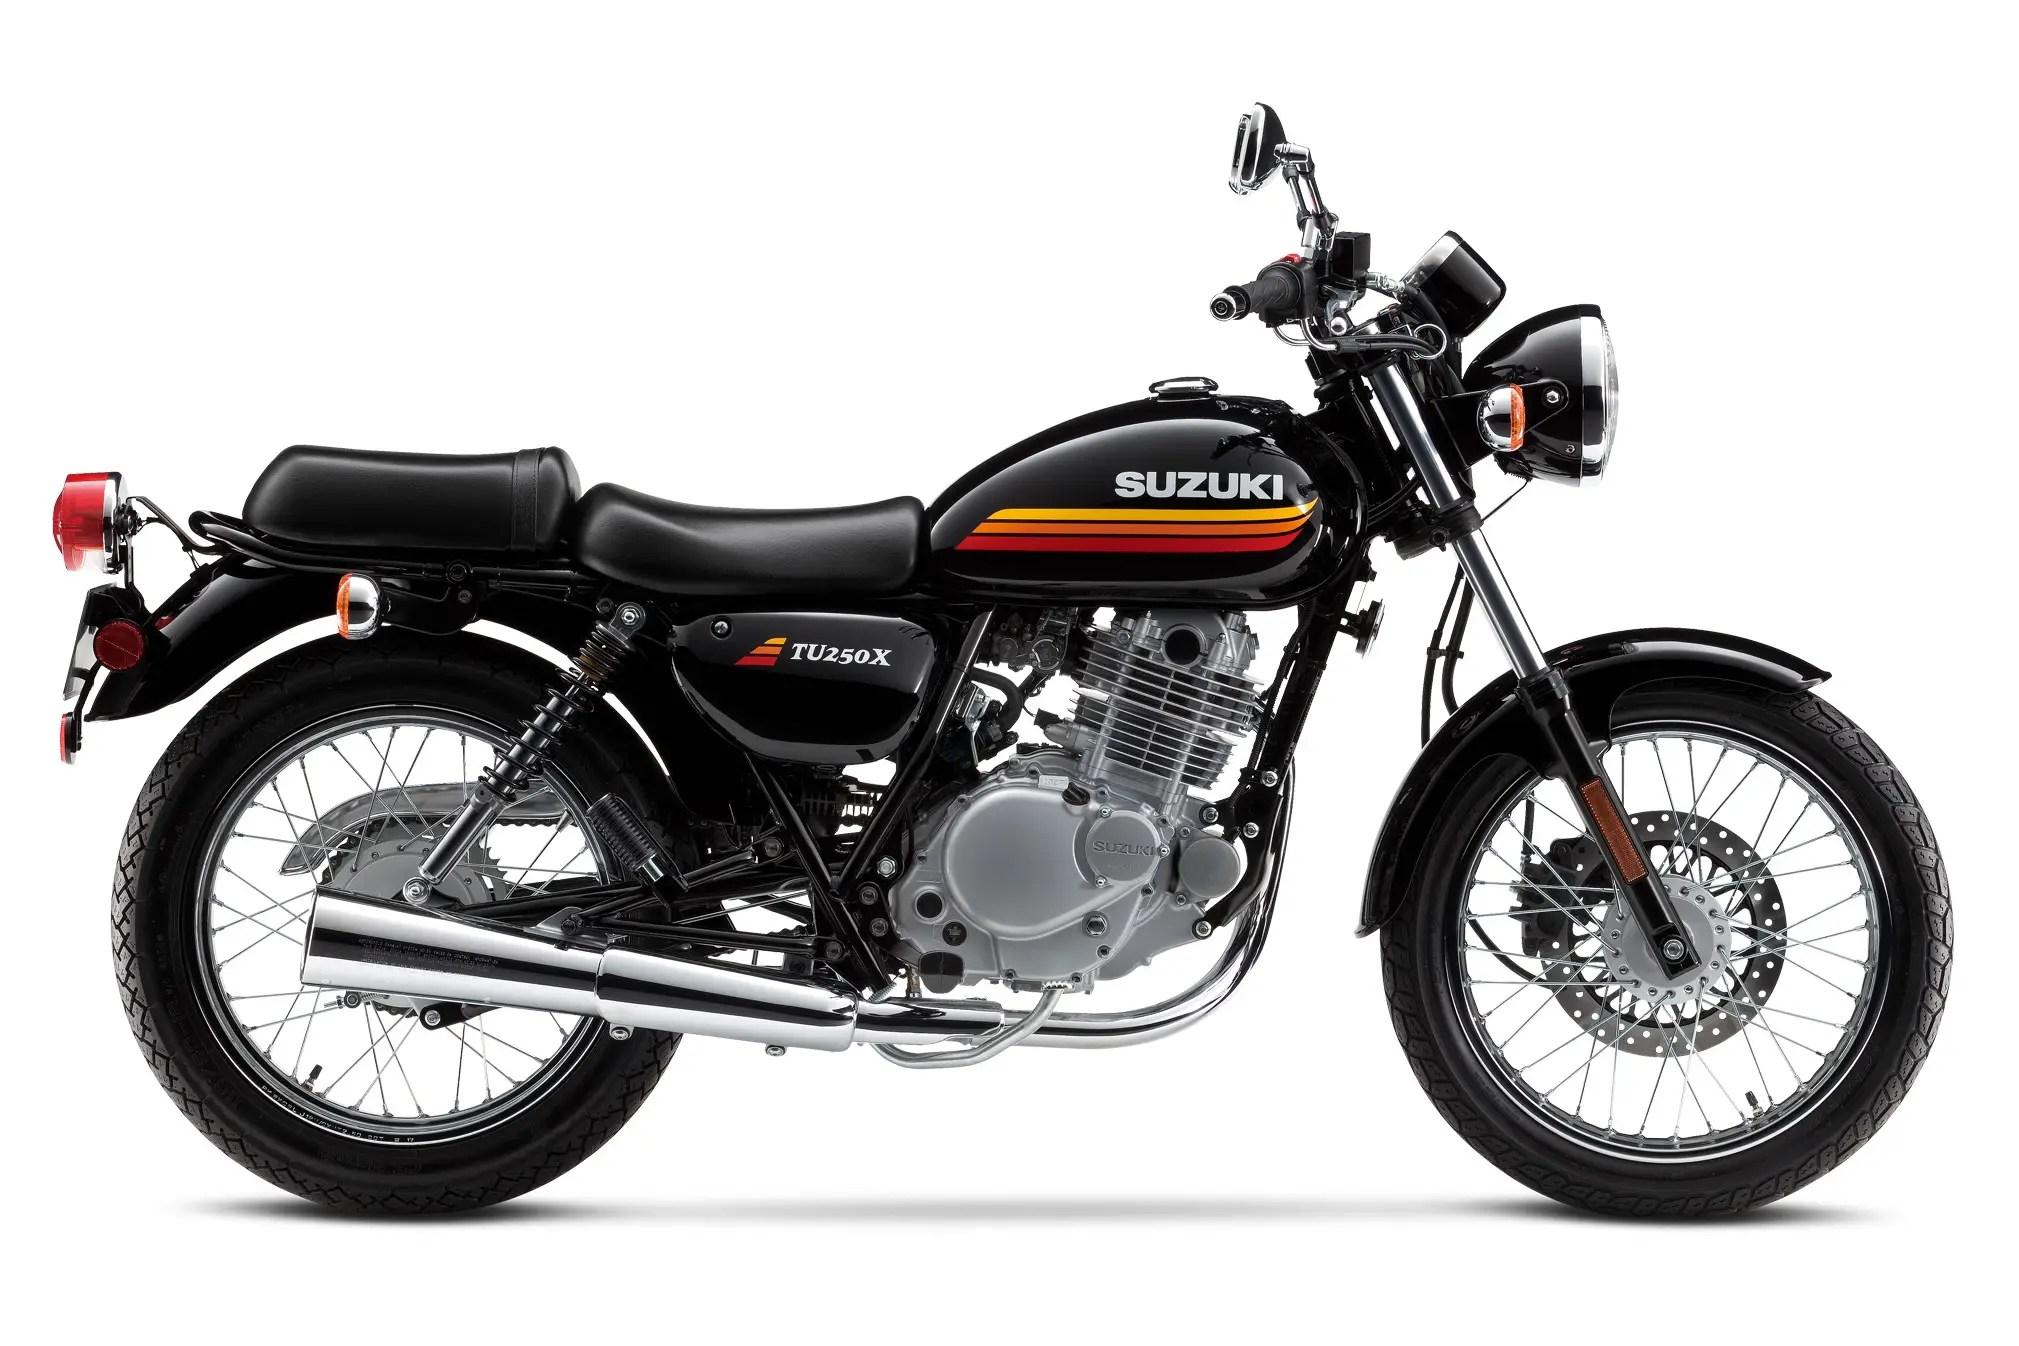 2019 Suzuki TU250X Guide Total Motorcycle